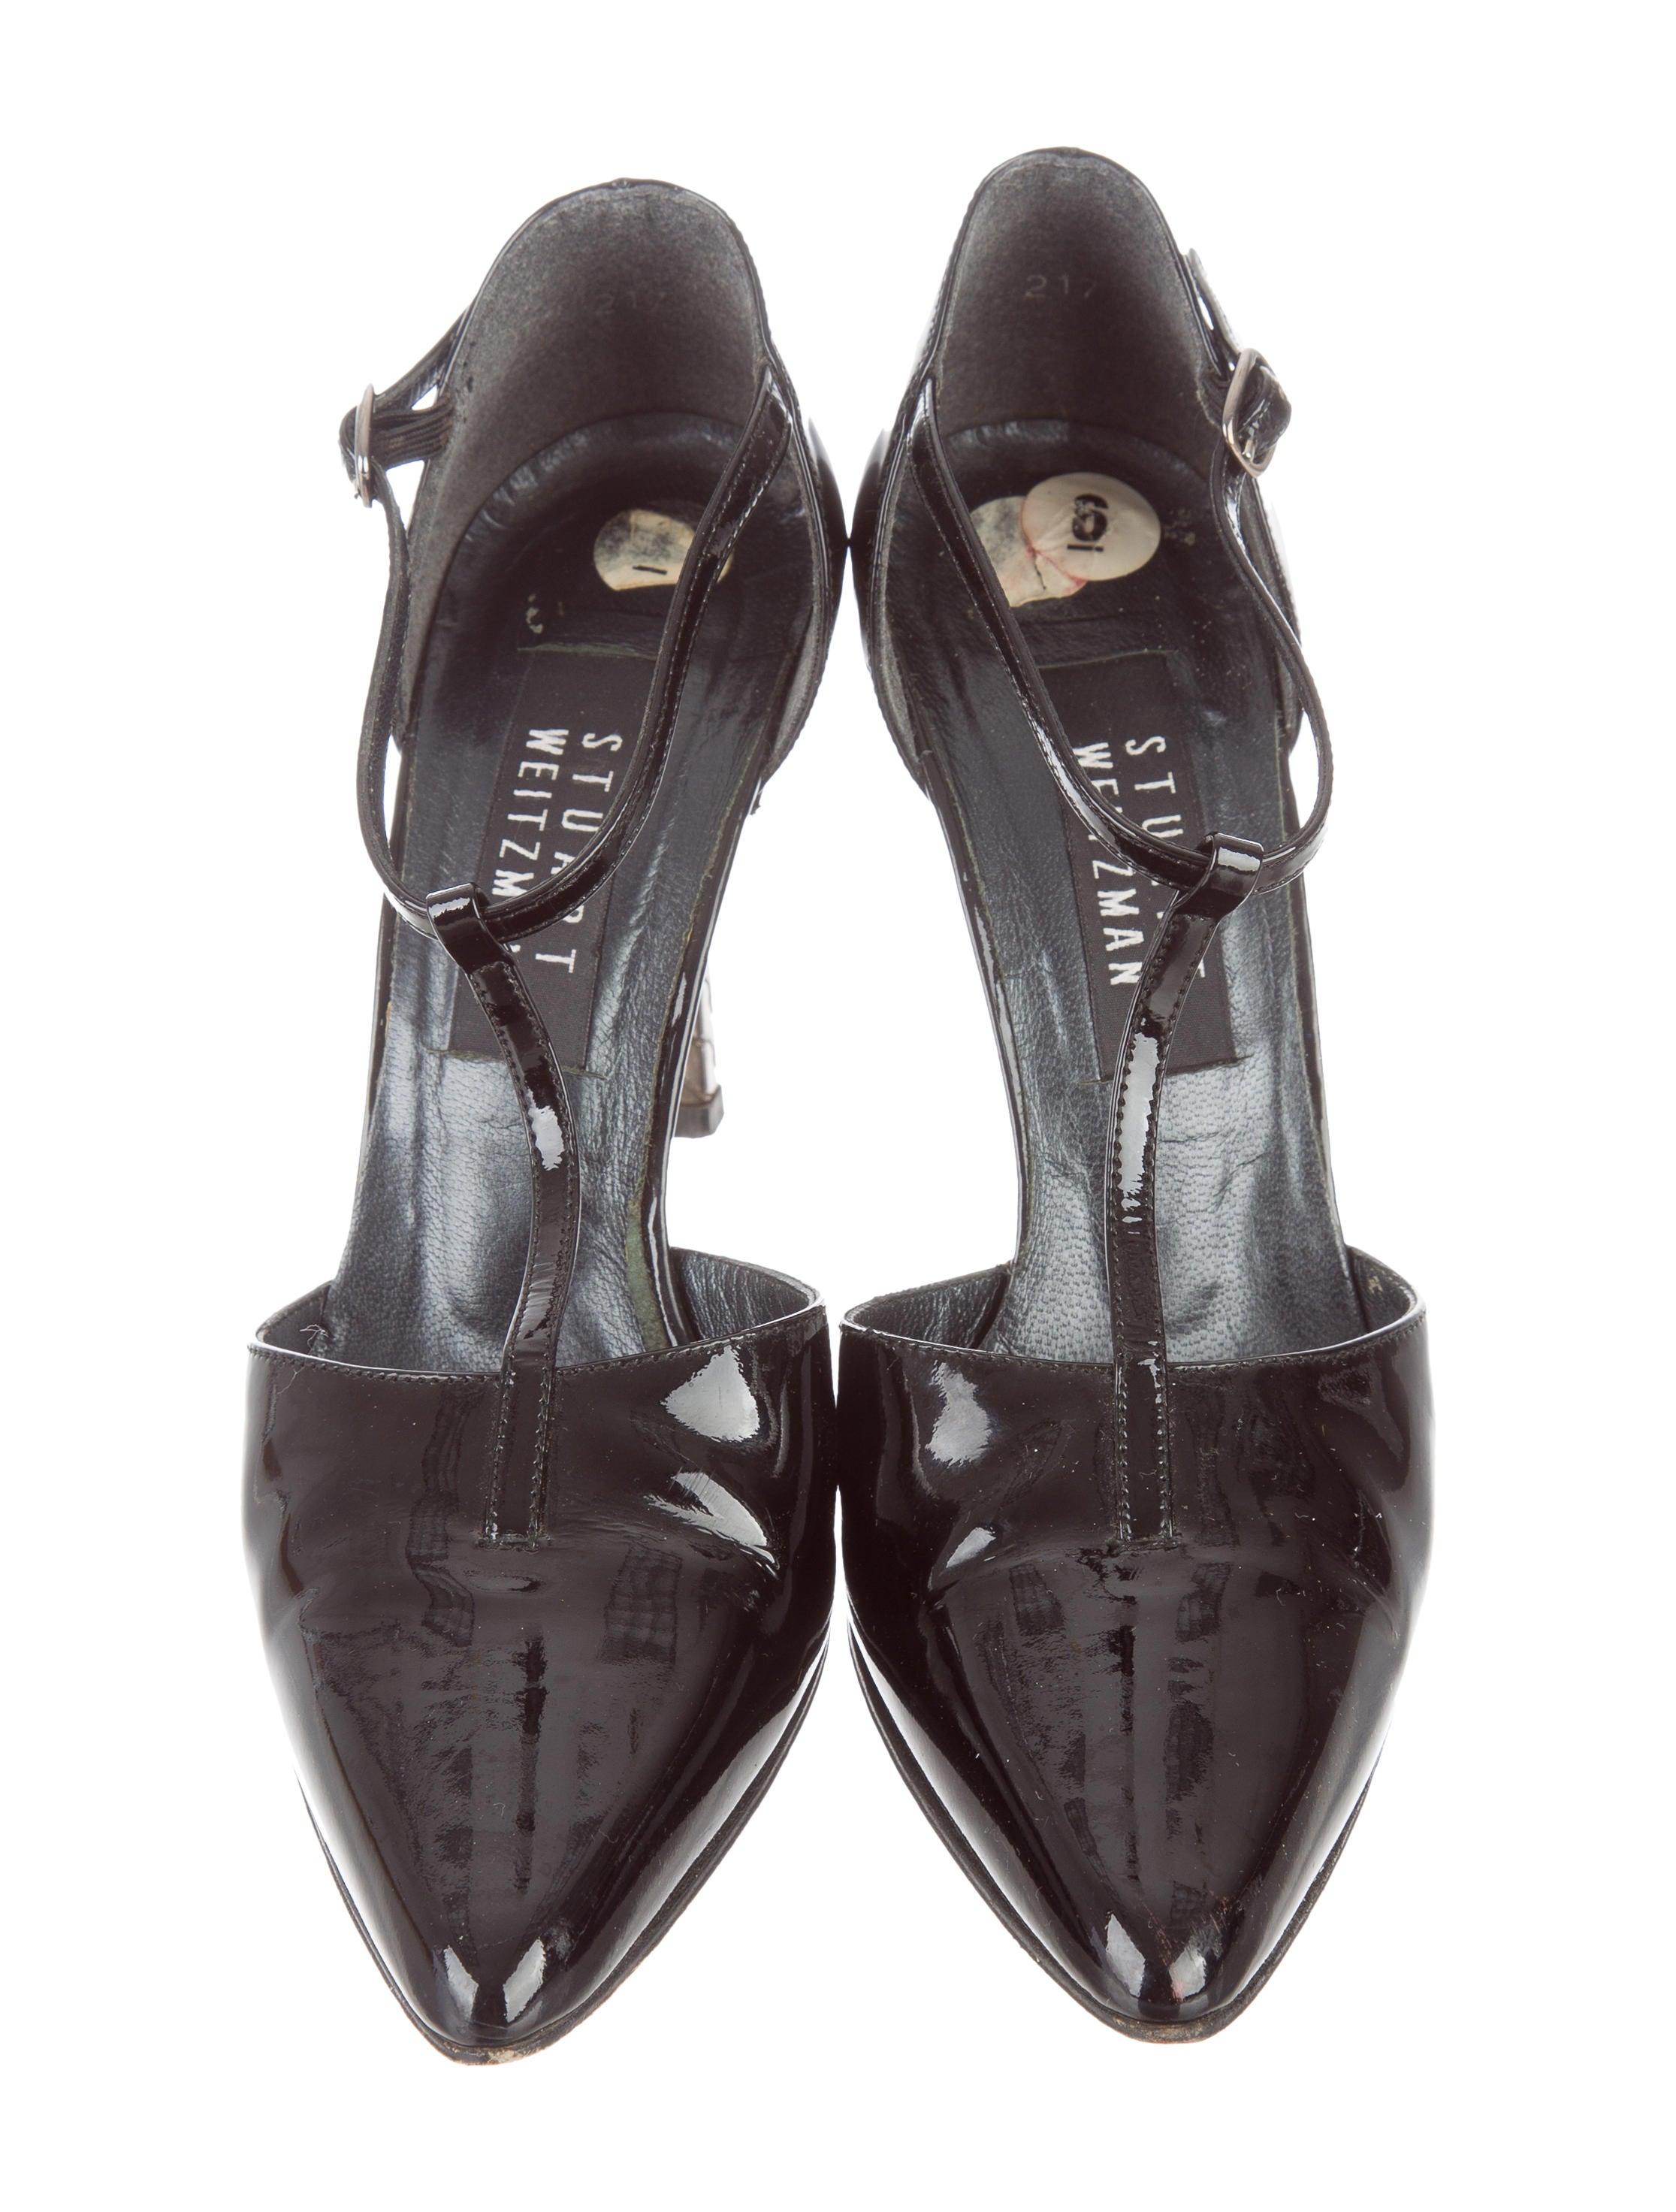 stuart weitzman patent leather t strap pumps shoes wsu28607 the realreal. Black Bedroom Furniture Sets. Home Design Ideas